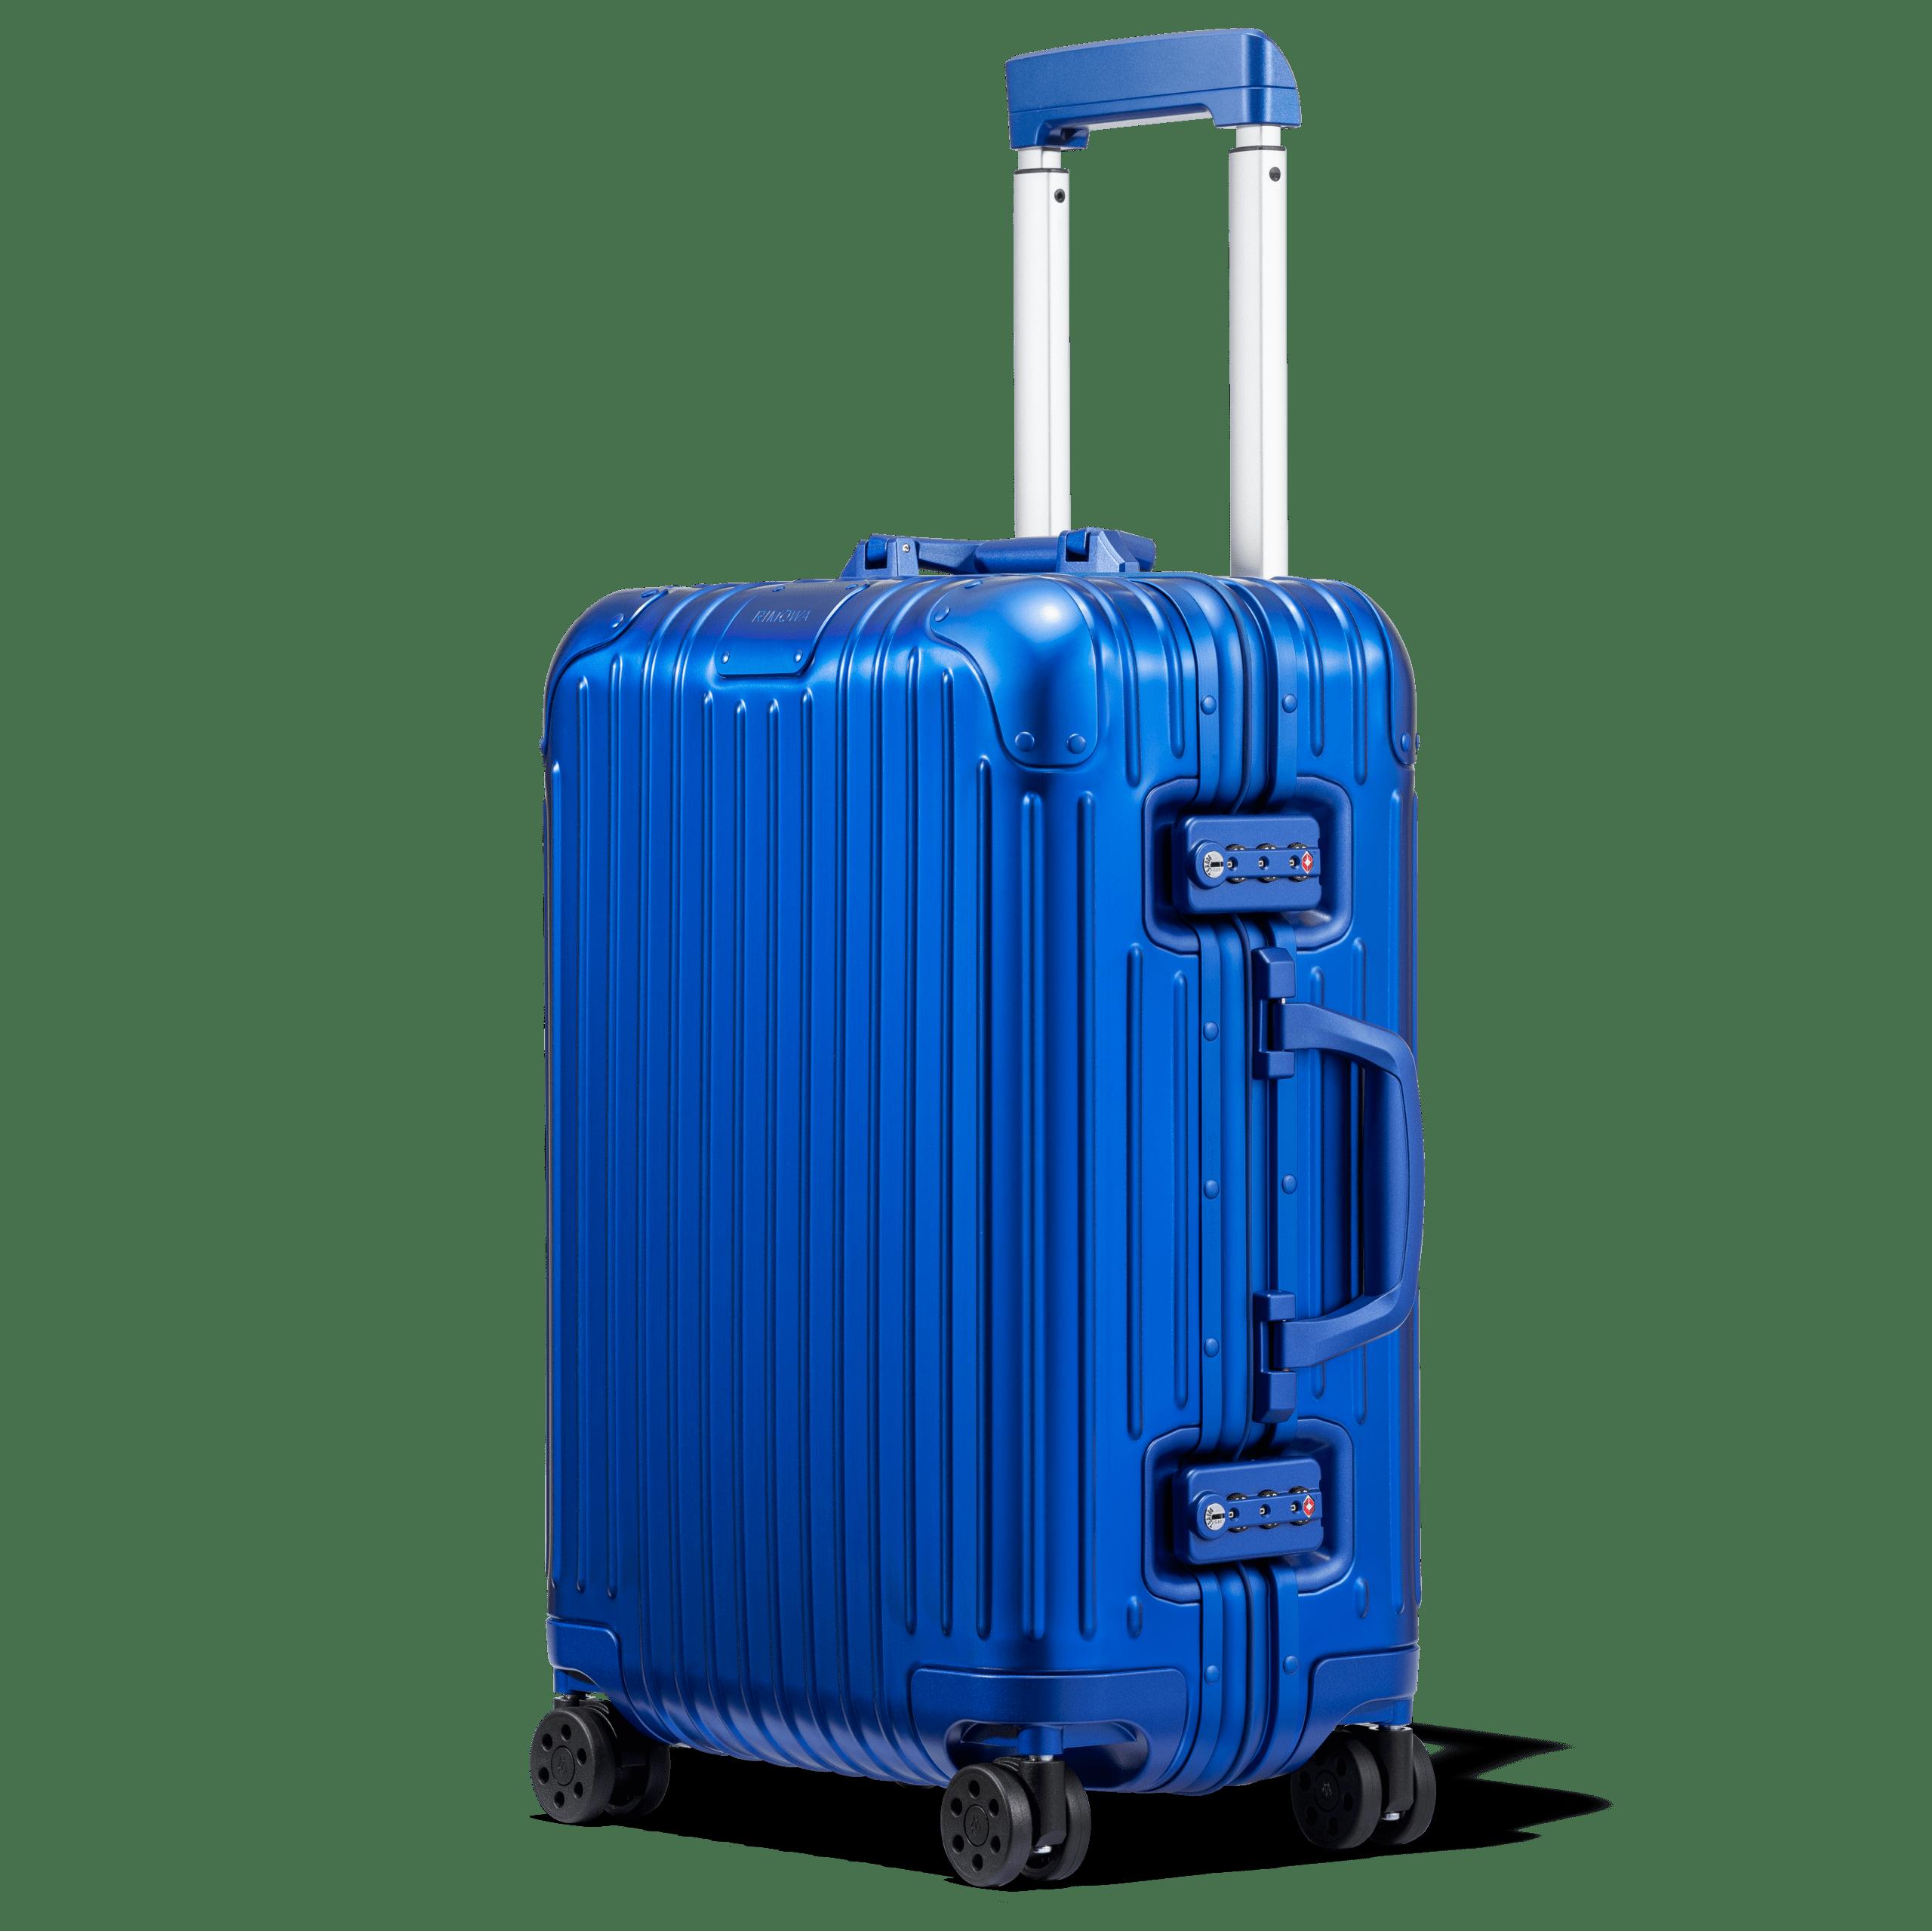 Rimowa Suitcase Blue